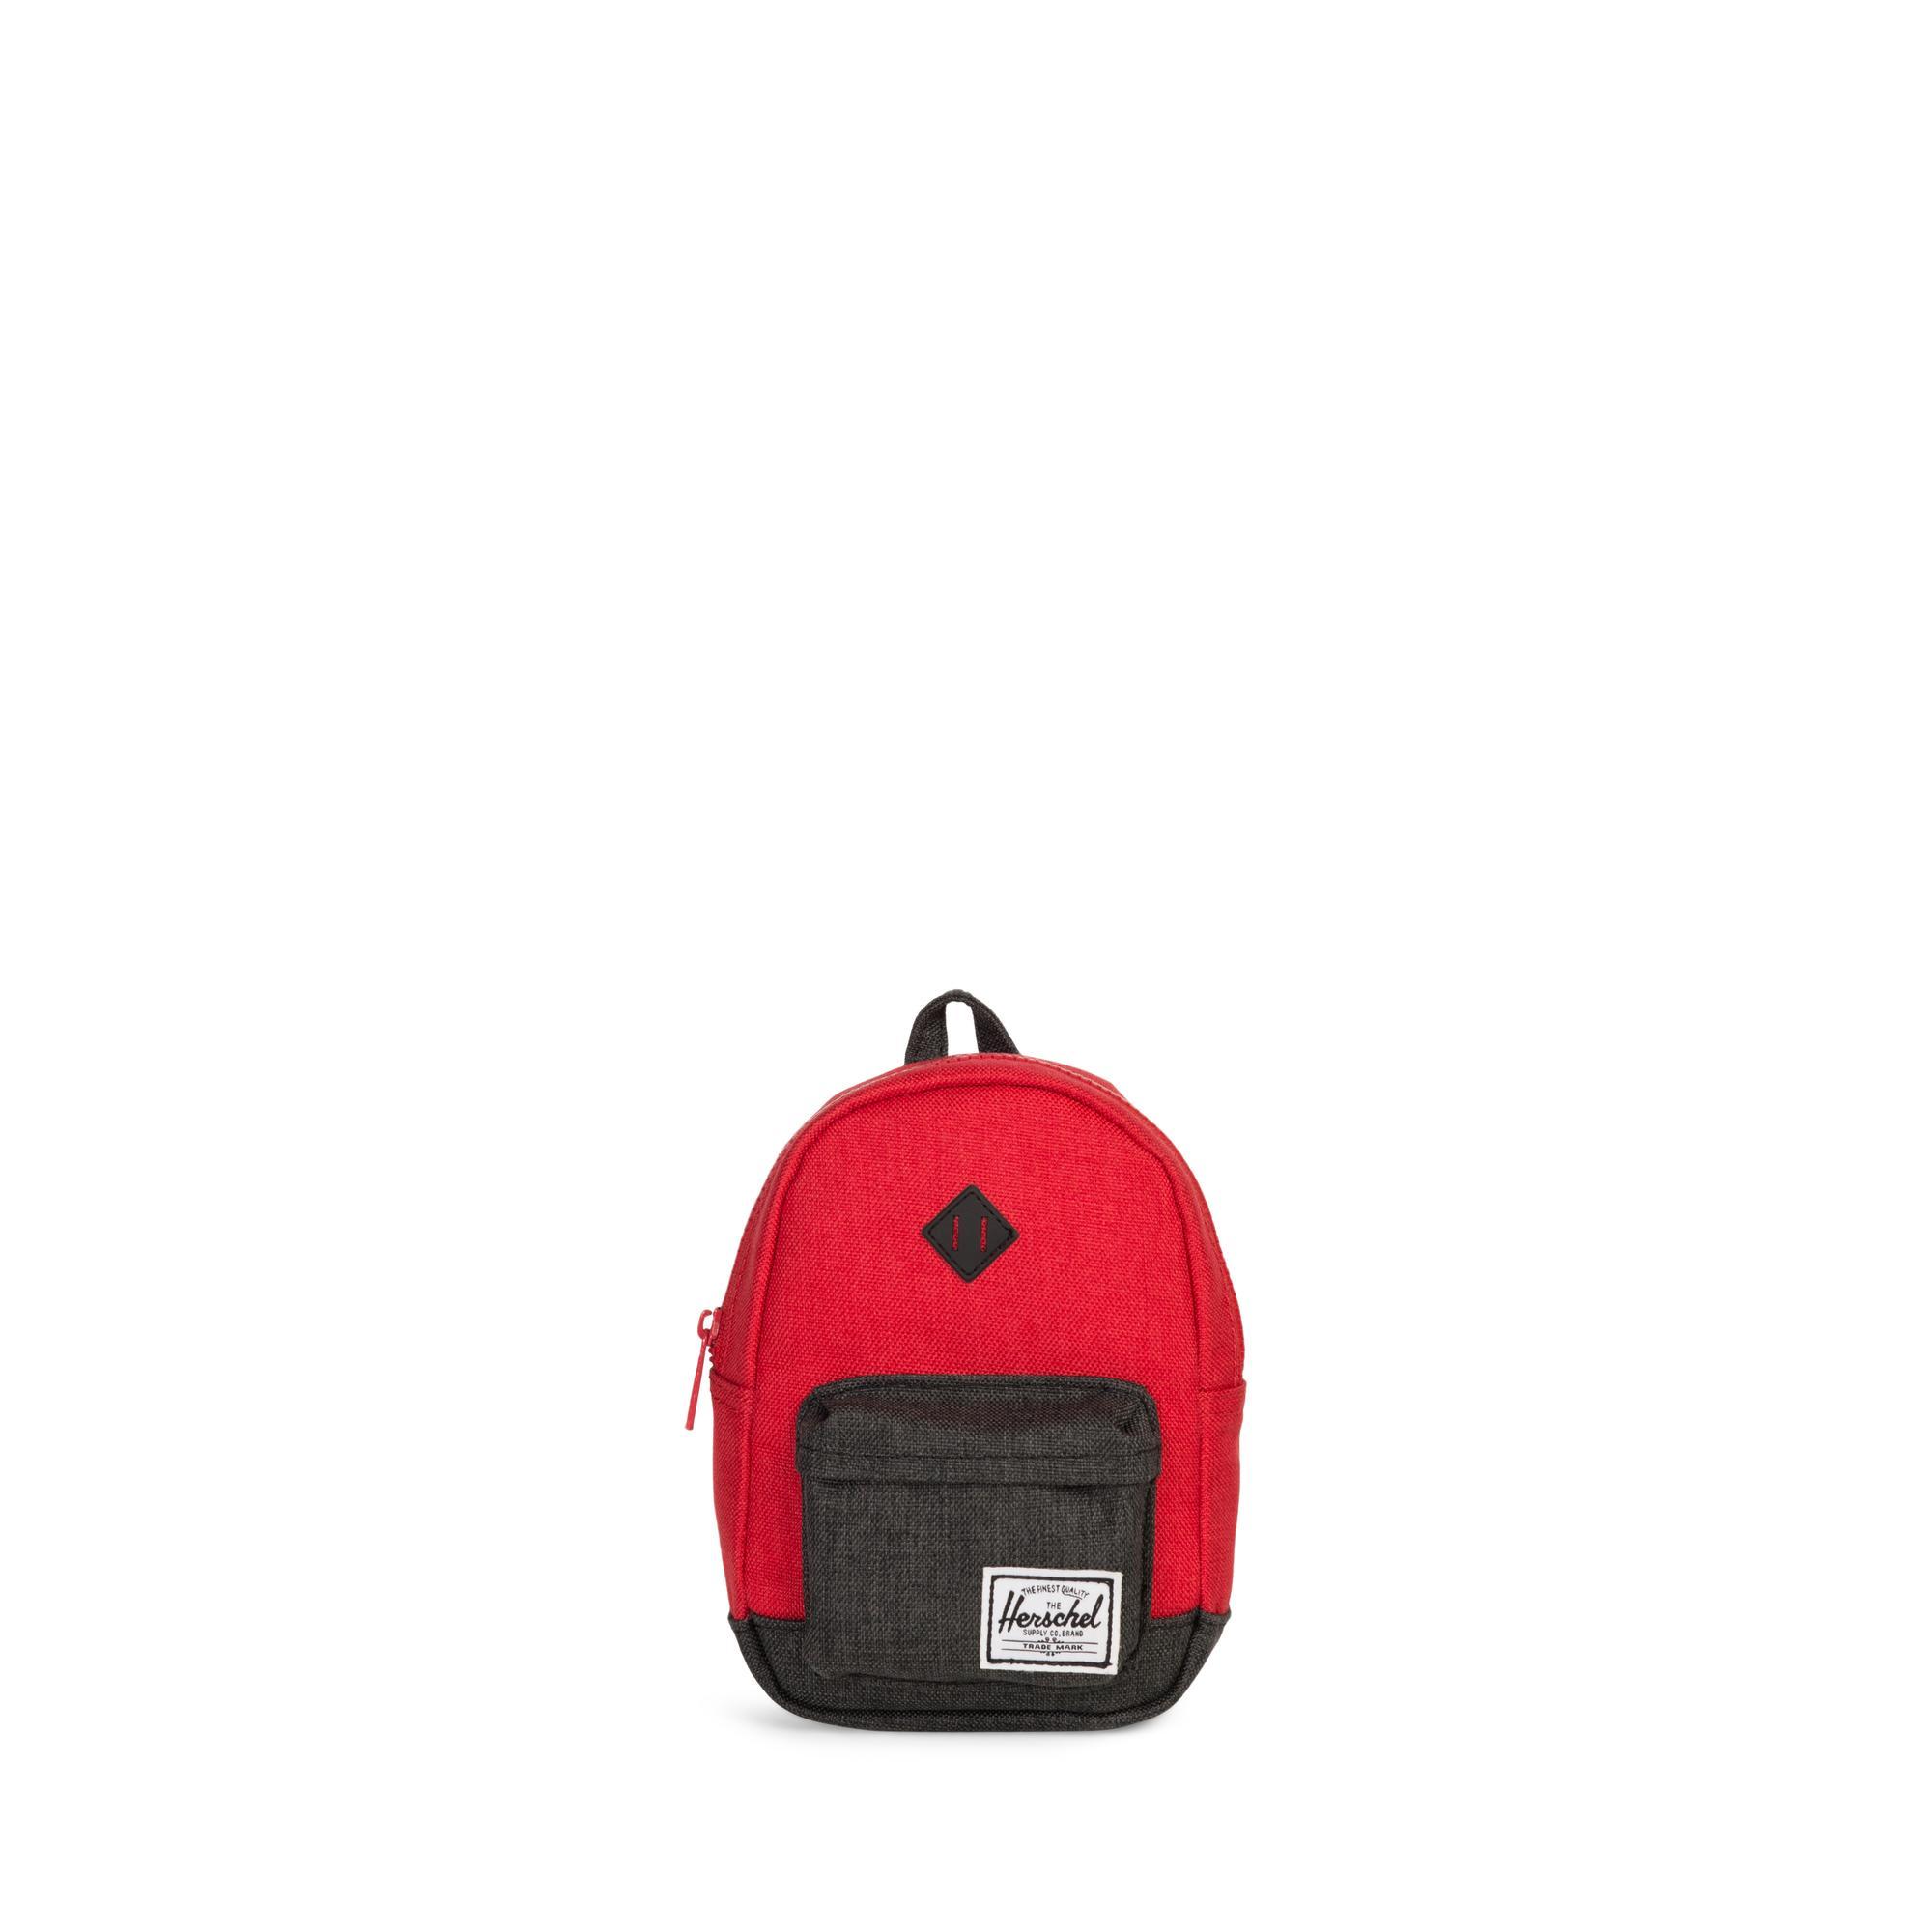 268202b48cc Heritage Backpack Mini